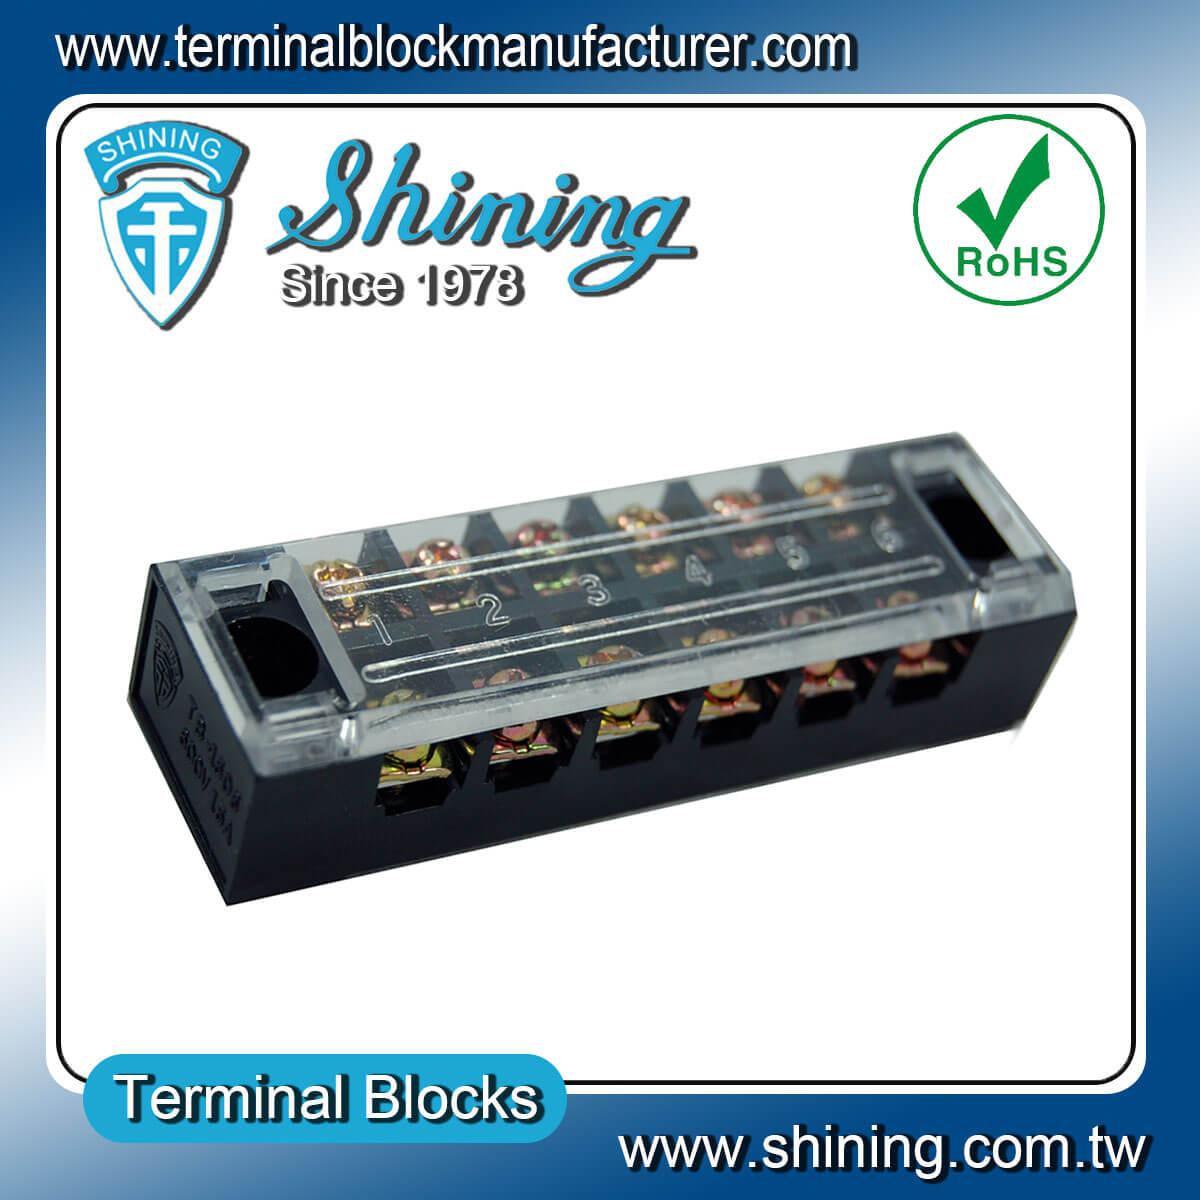 TB-2506L 600V 25A 6Pole固定式柵欄端子台